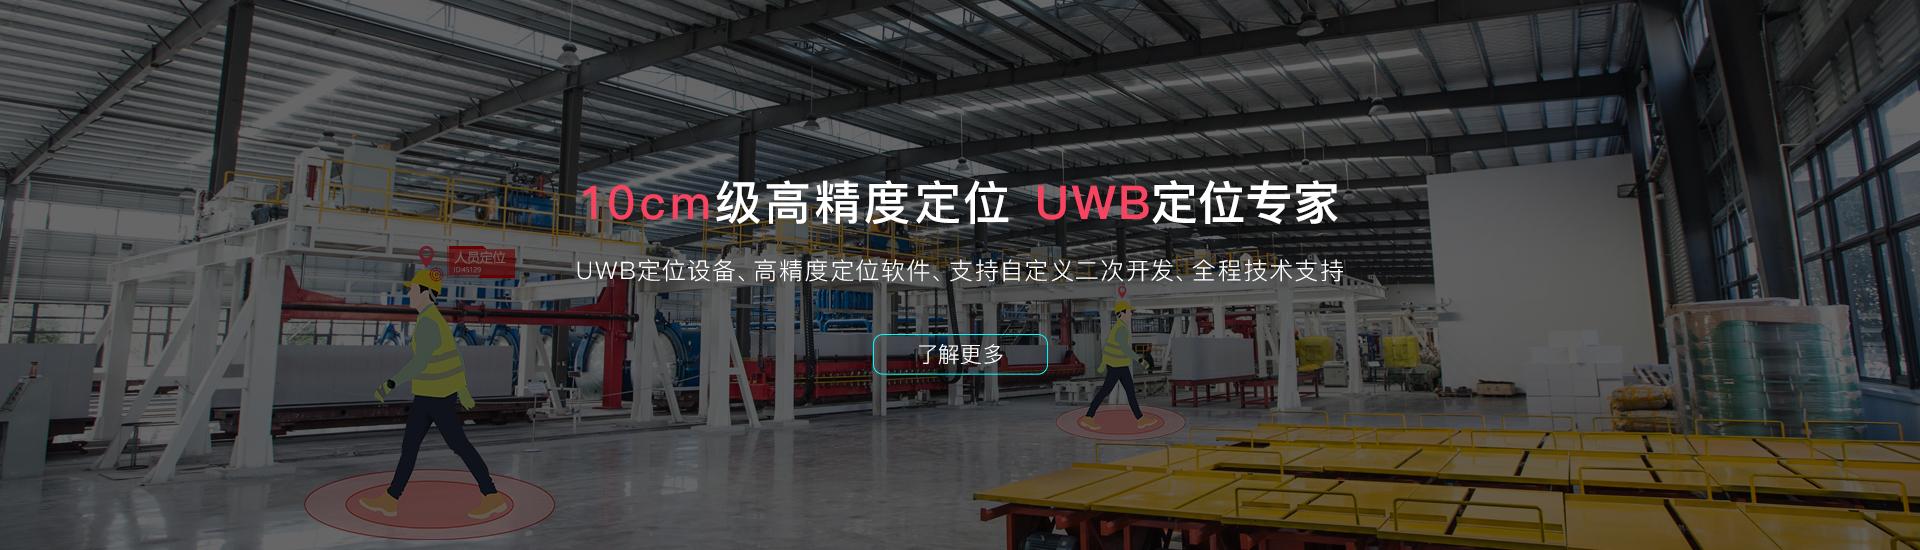 UWB定位软件